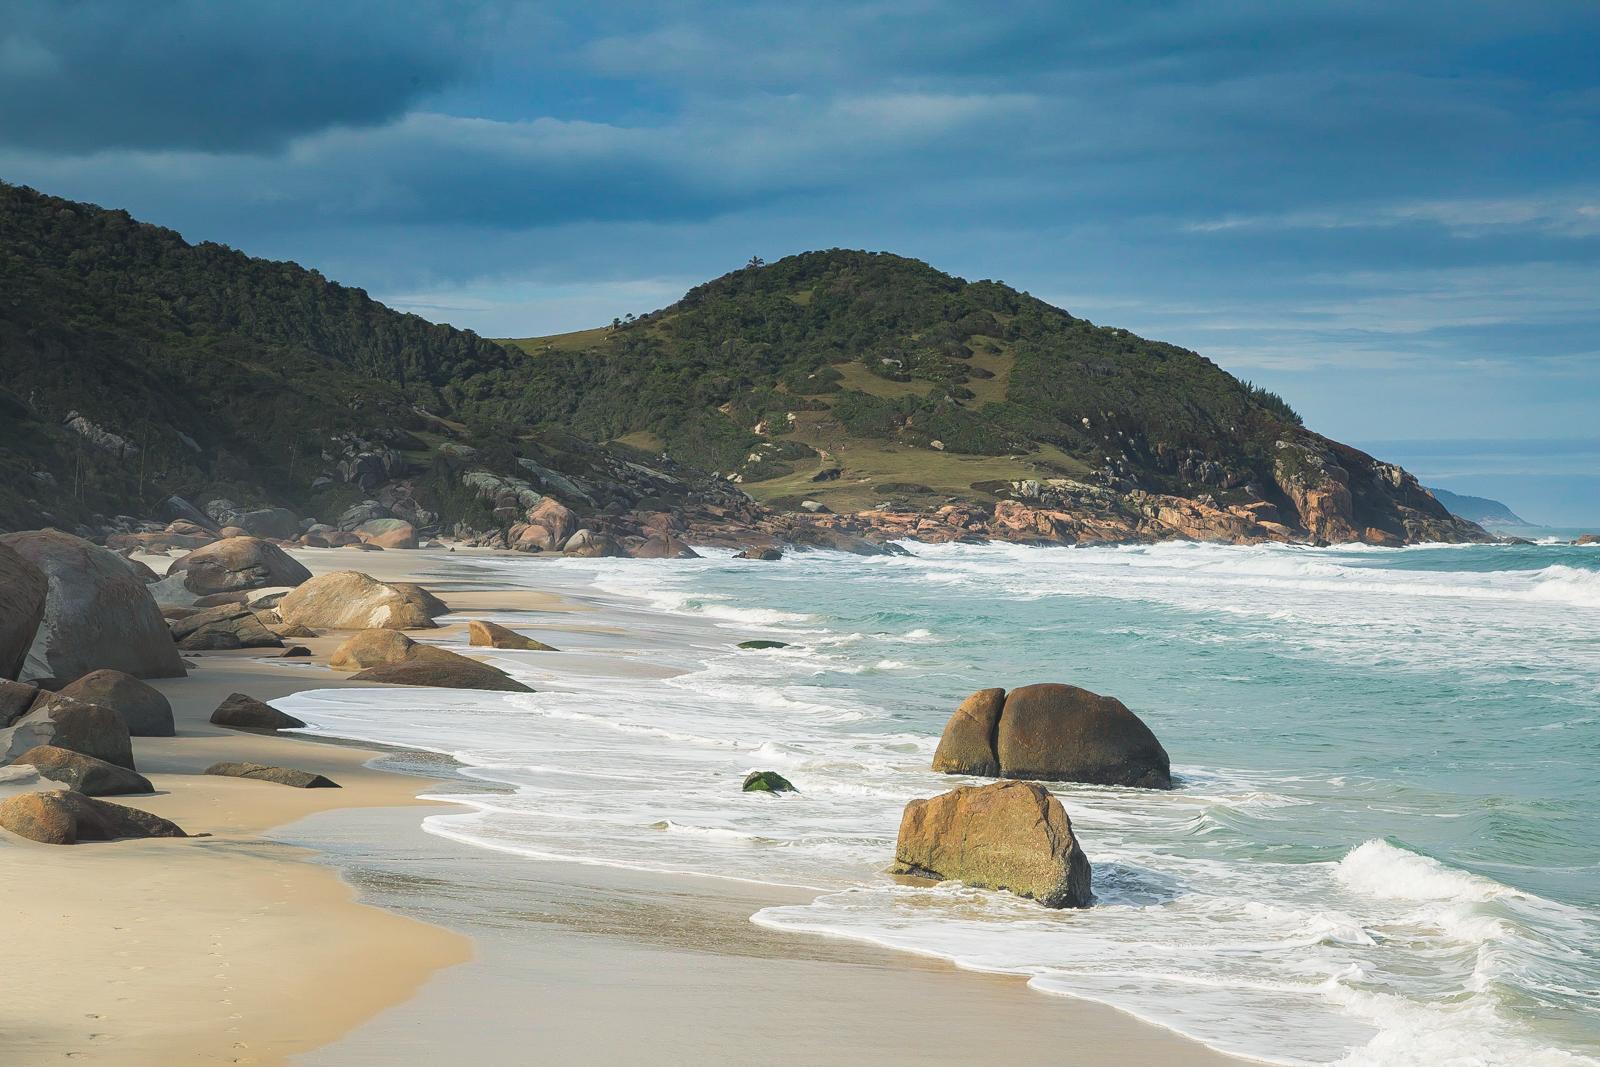 Boulders on Solita Beach, Brazil